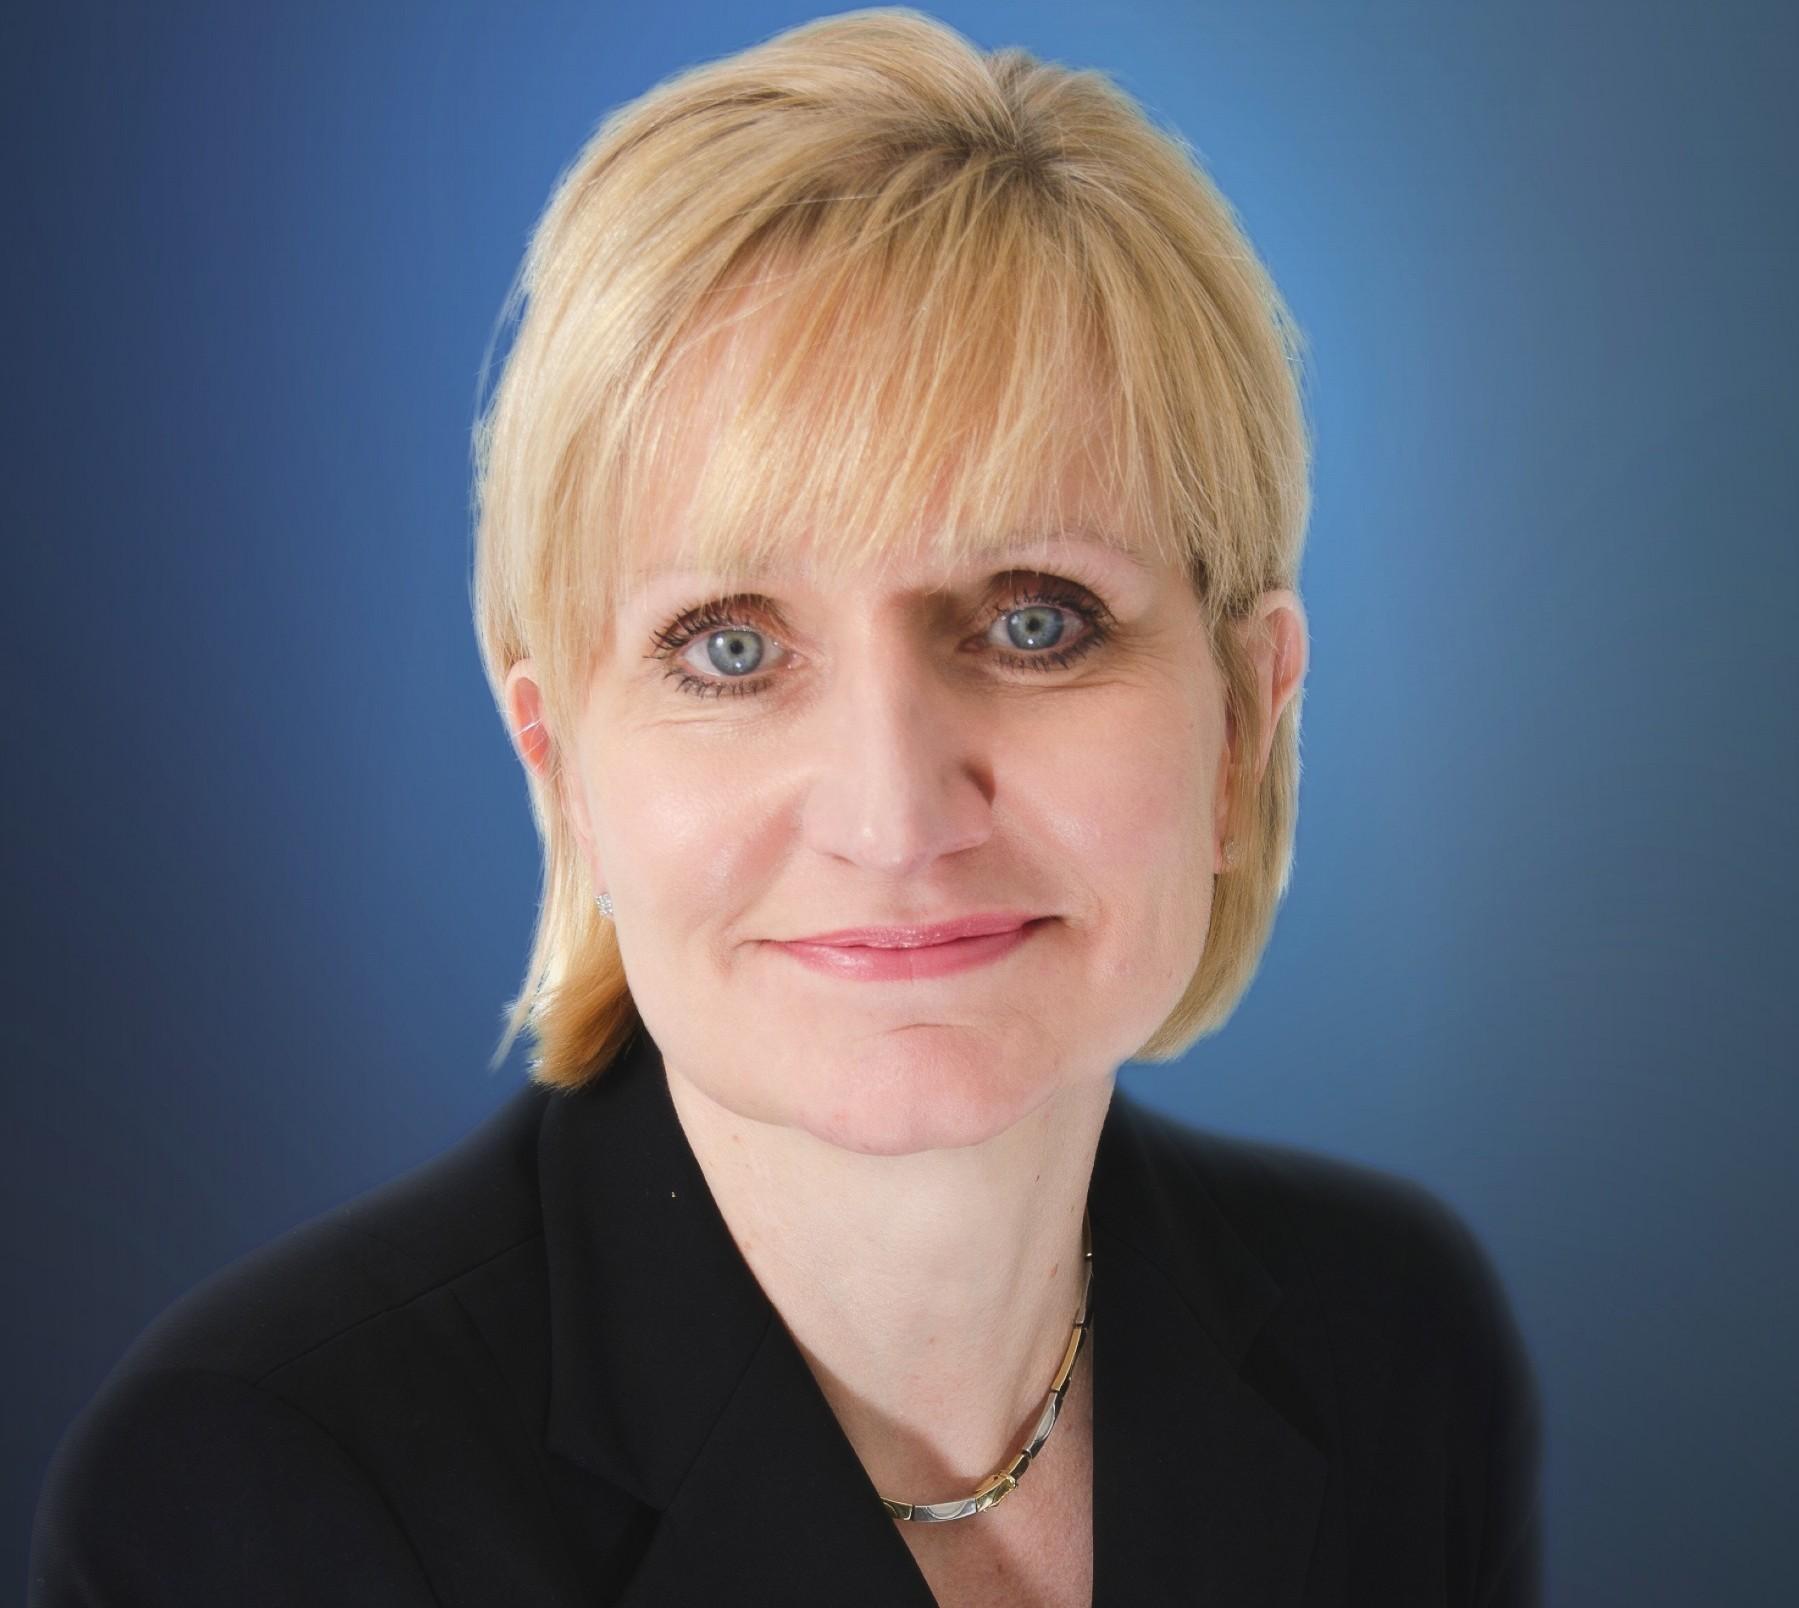 Oil & Gas UK chief executive Deirdre Michie